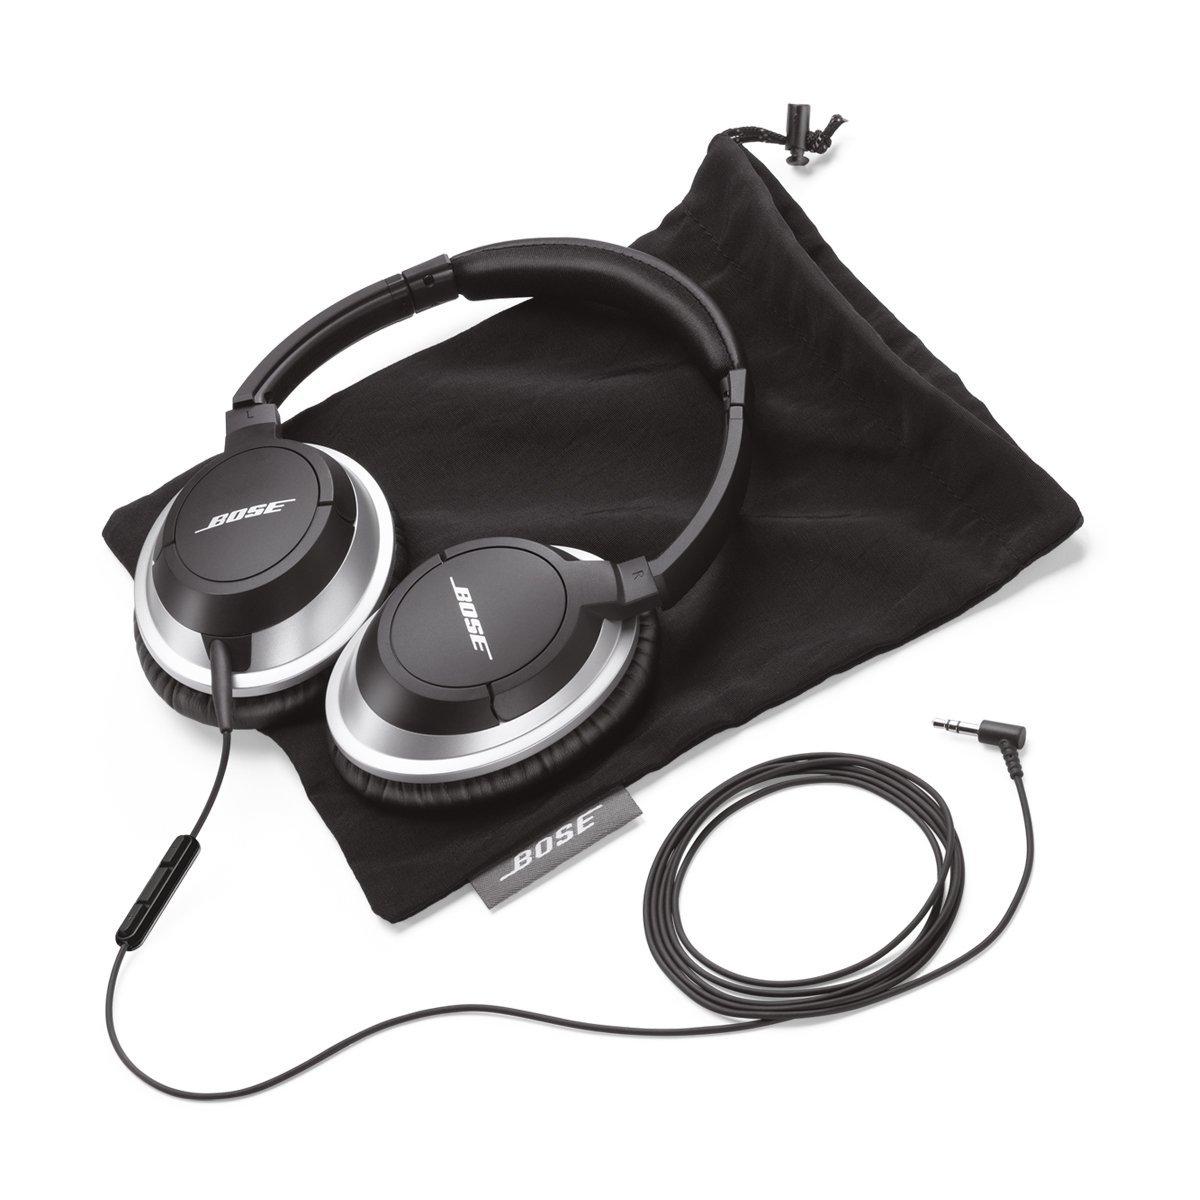 bose-ae2i-headphones